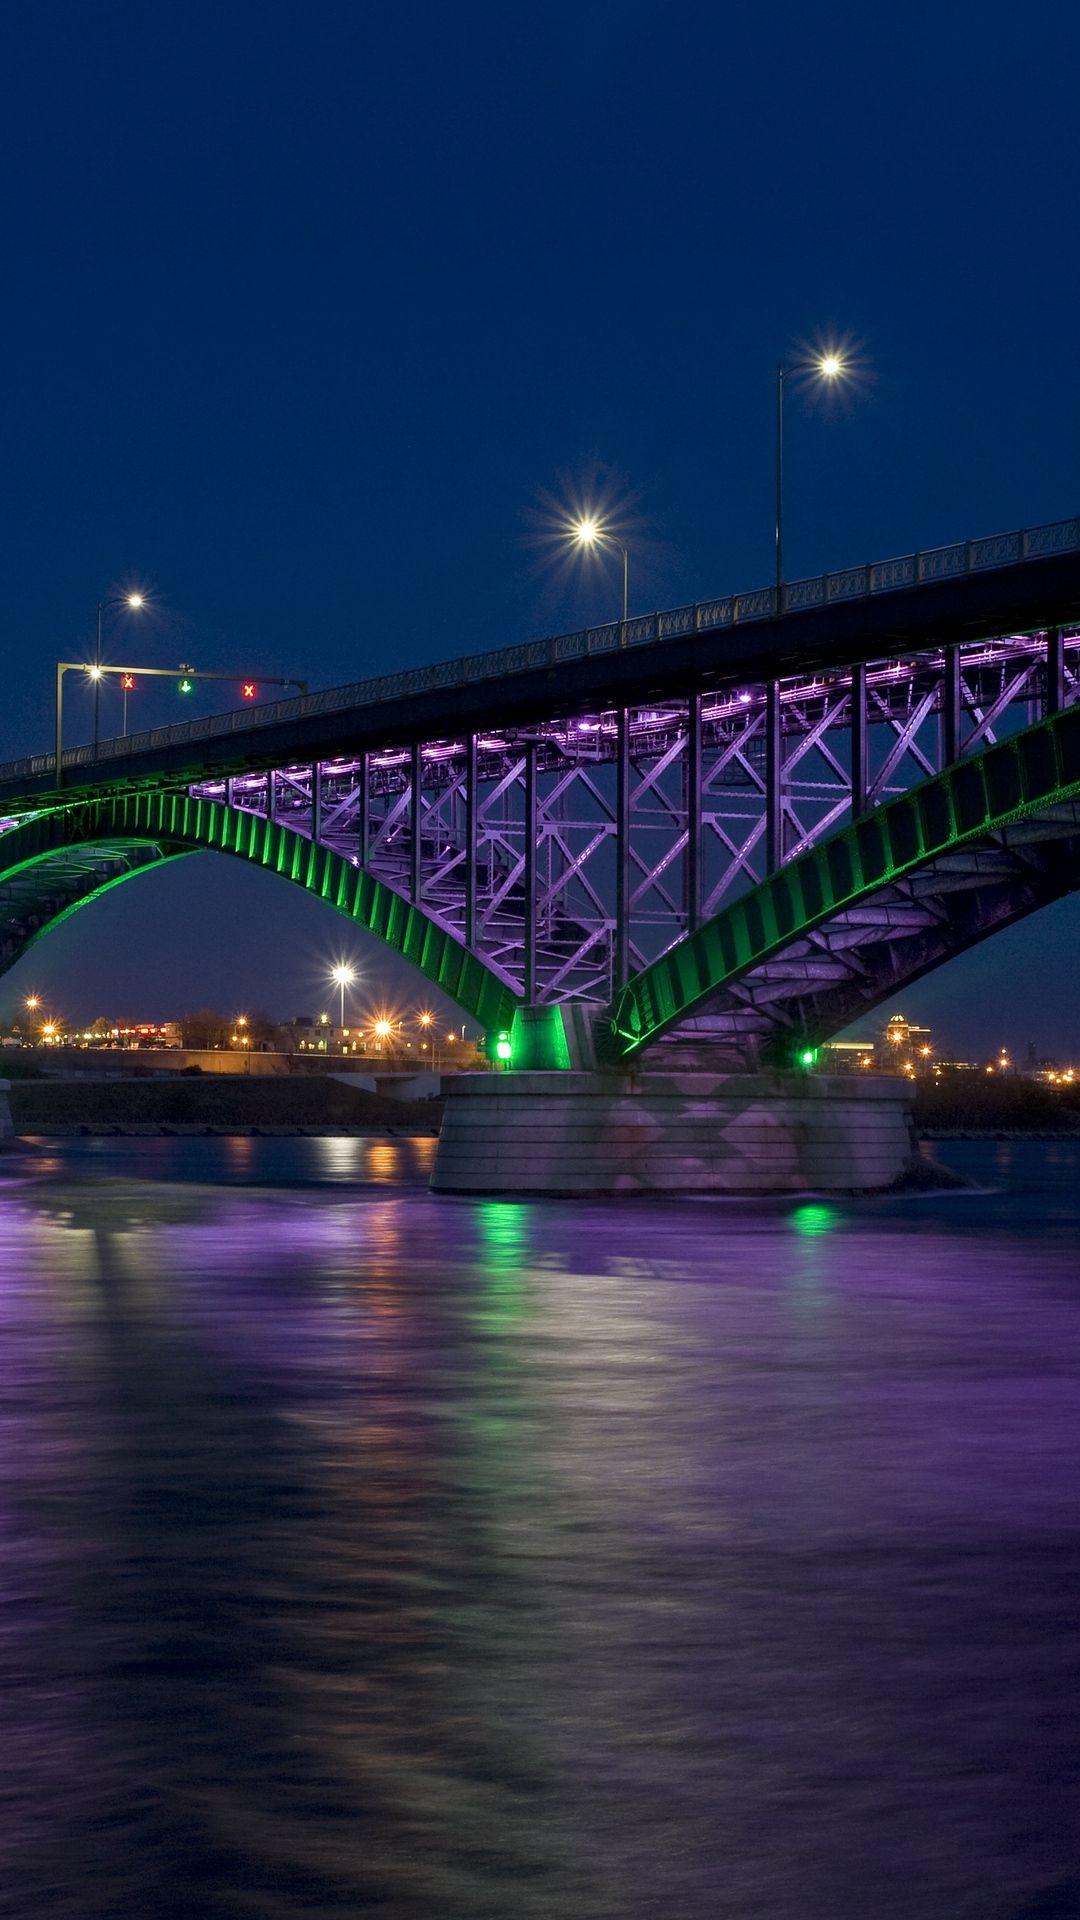 Communal Bridge Lighting